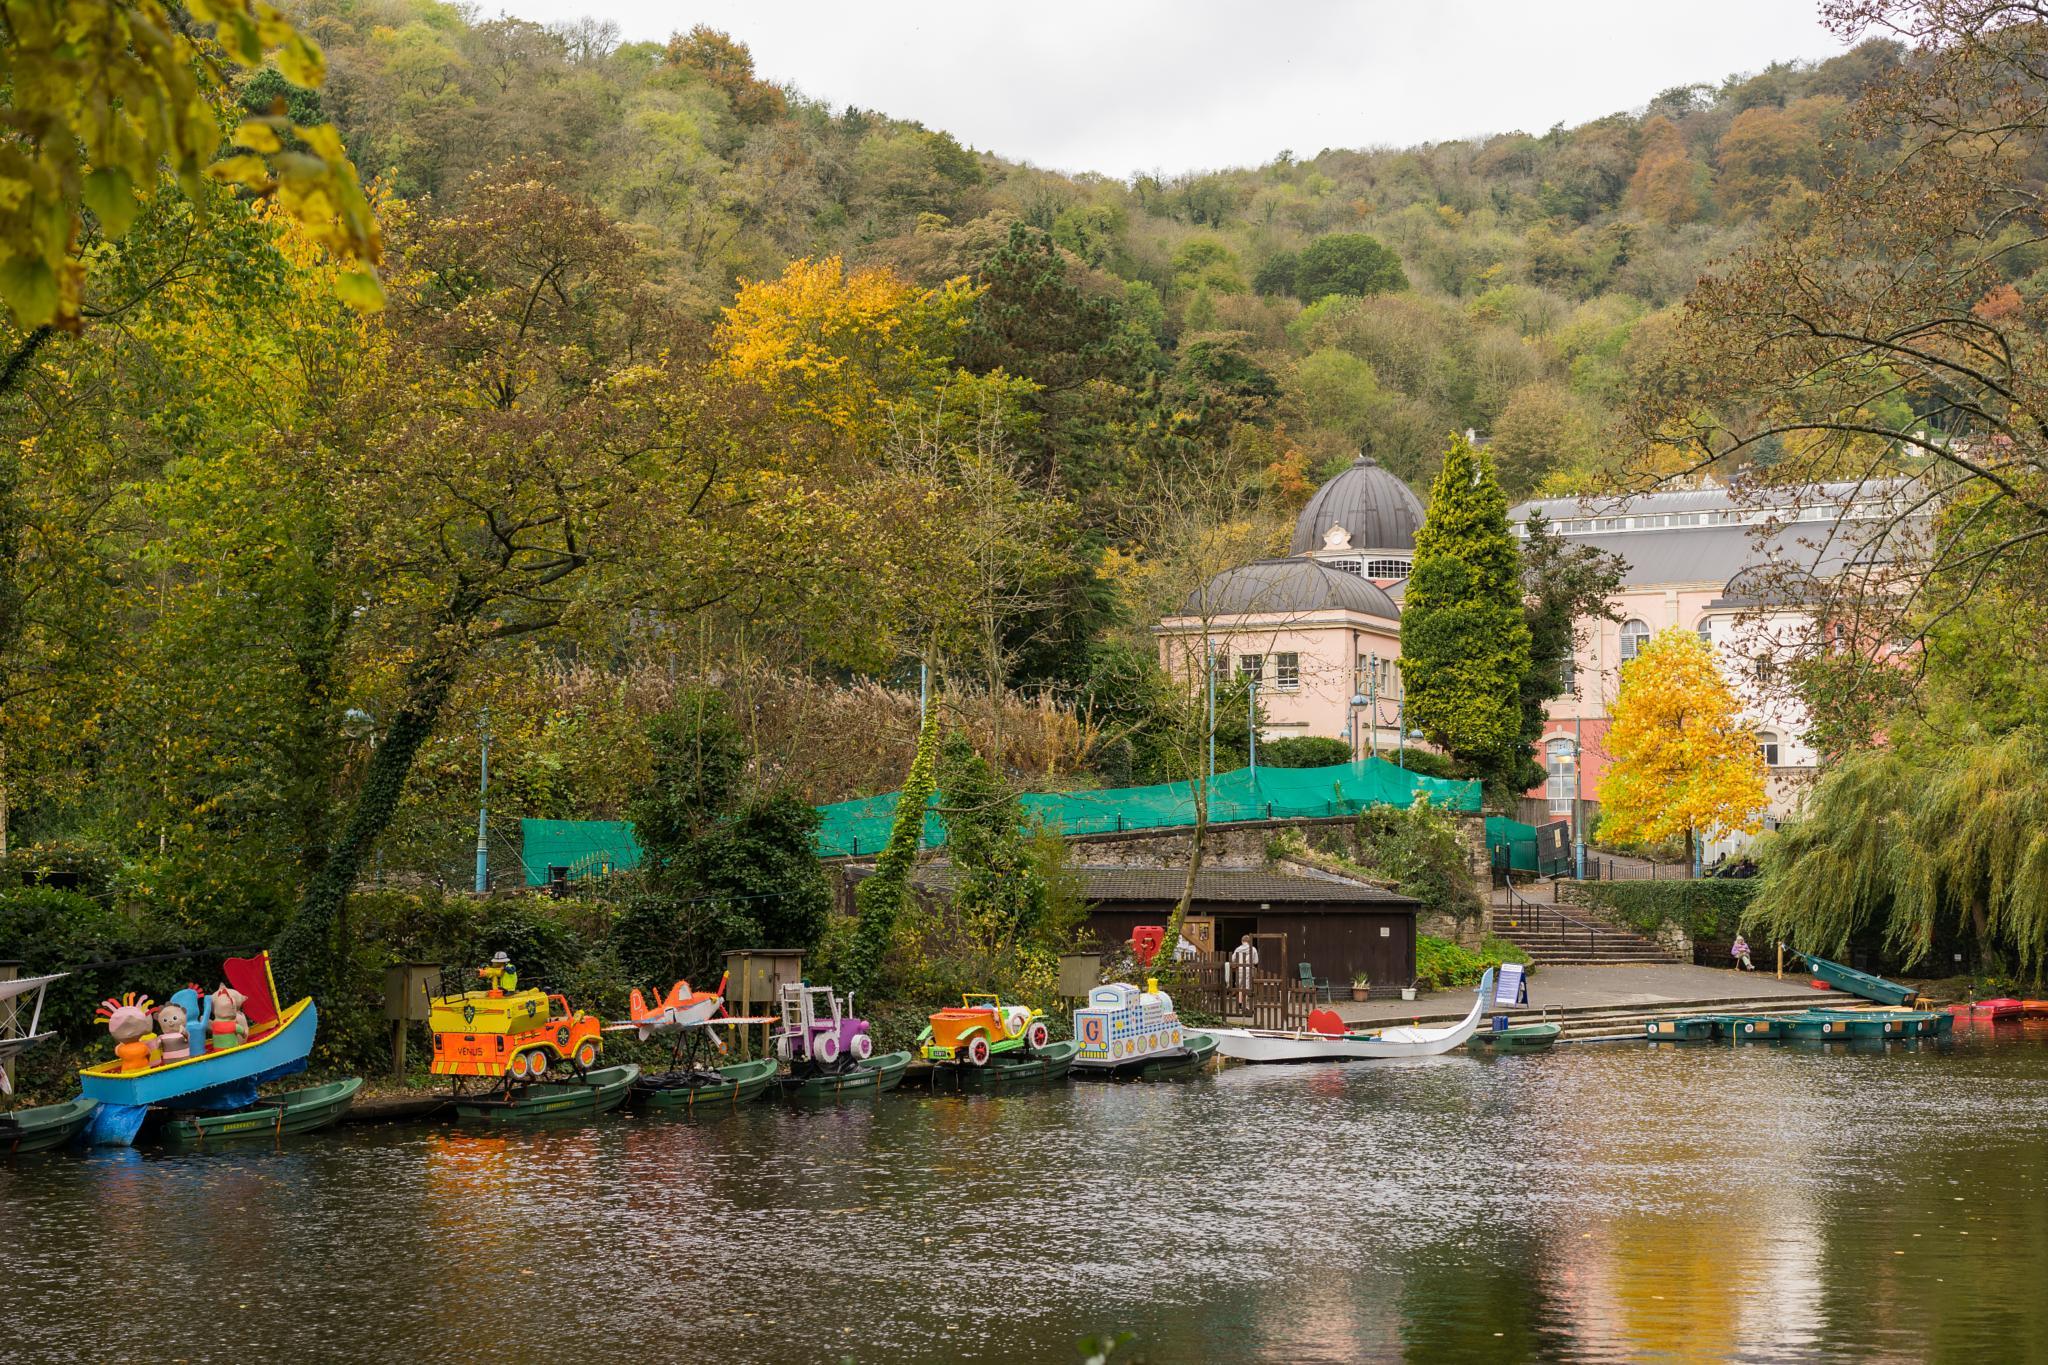 Autumn Colours at Matlock Bath by daviddukesell